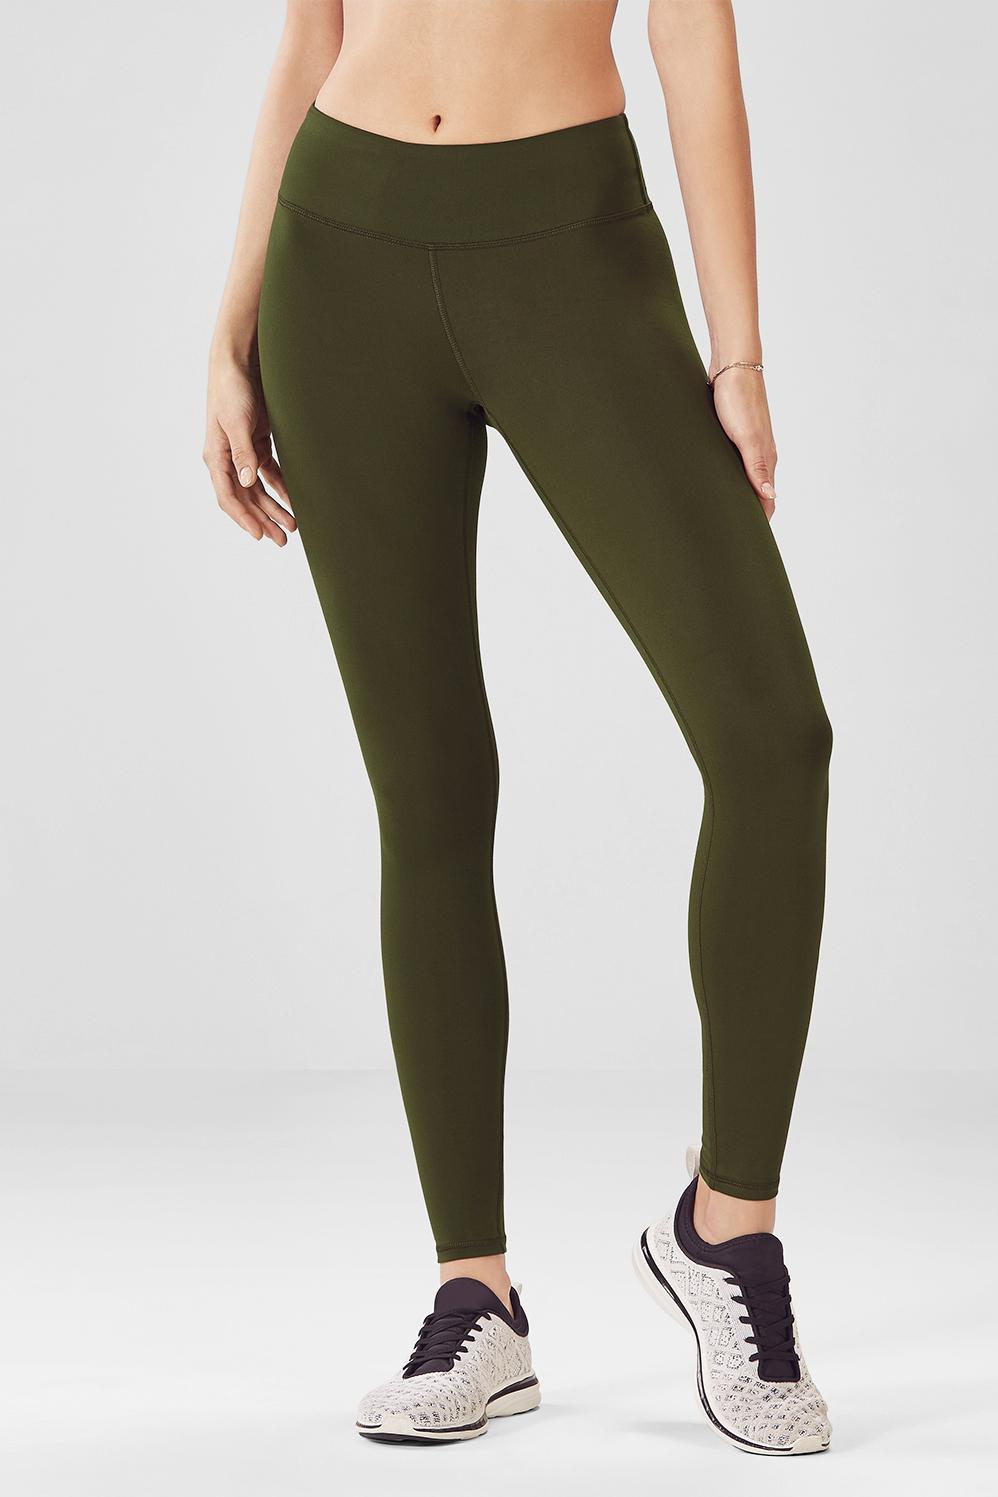 415e65da75d6b2 Salar Solid PowerHold® Leggings - Dark Olive